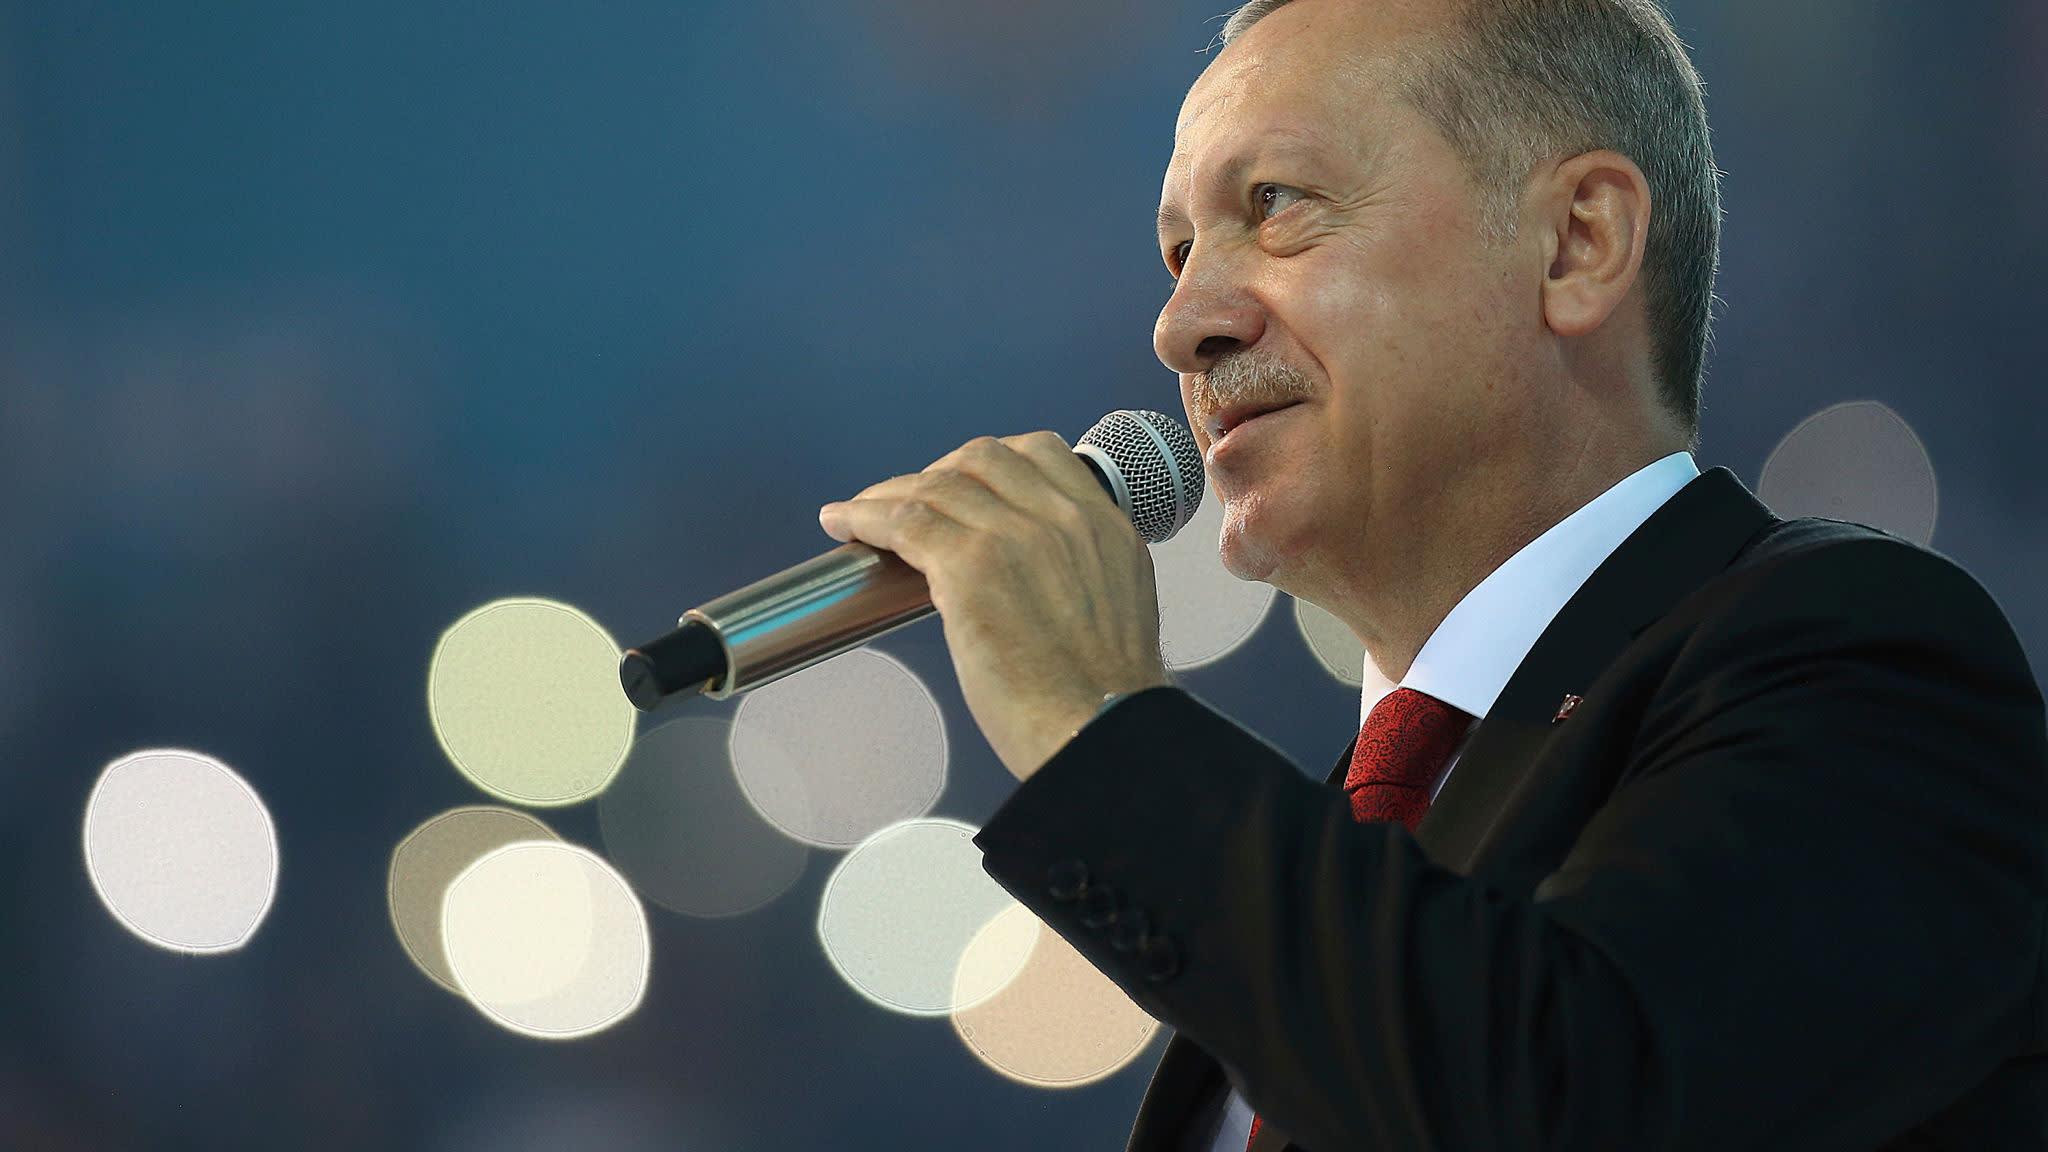 Turkey's Erdogan calls interest rates 'tool of exploitation'